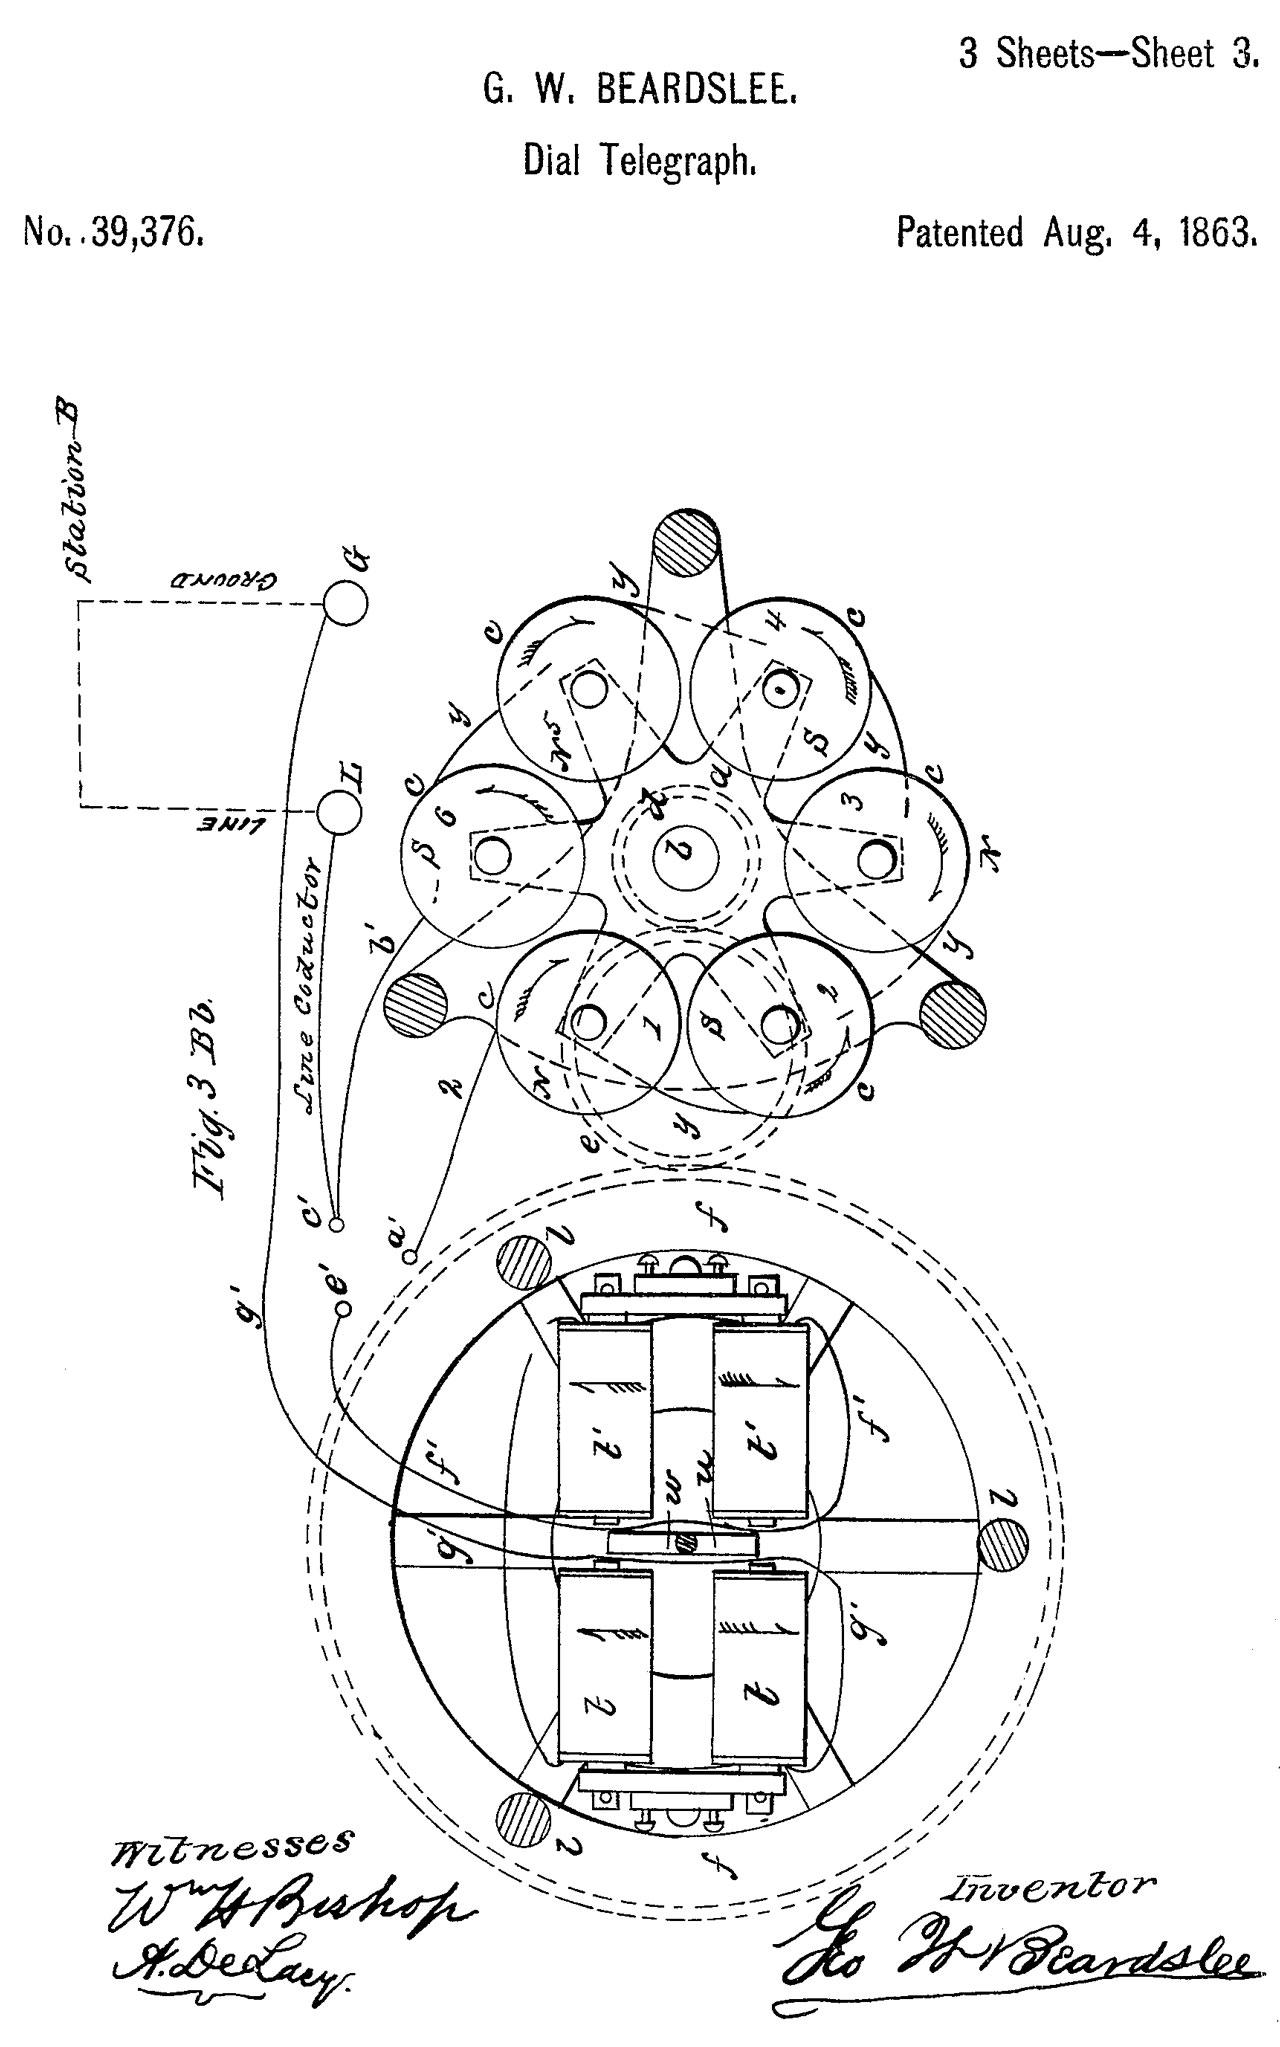 hight resolution of 39376 dial telegraph g w beardslee